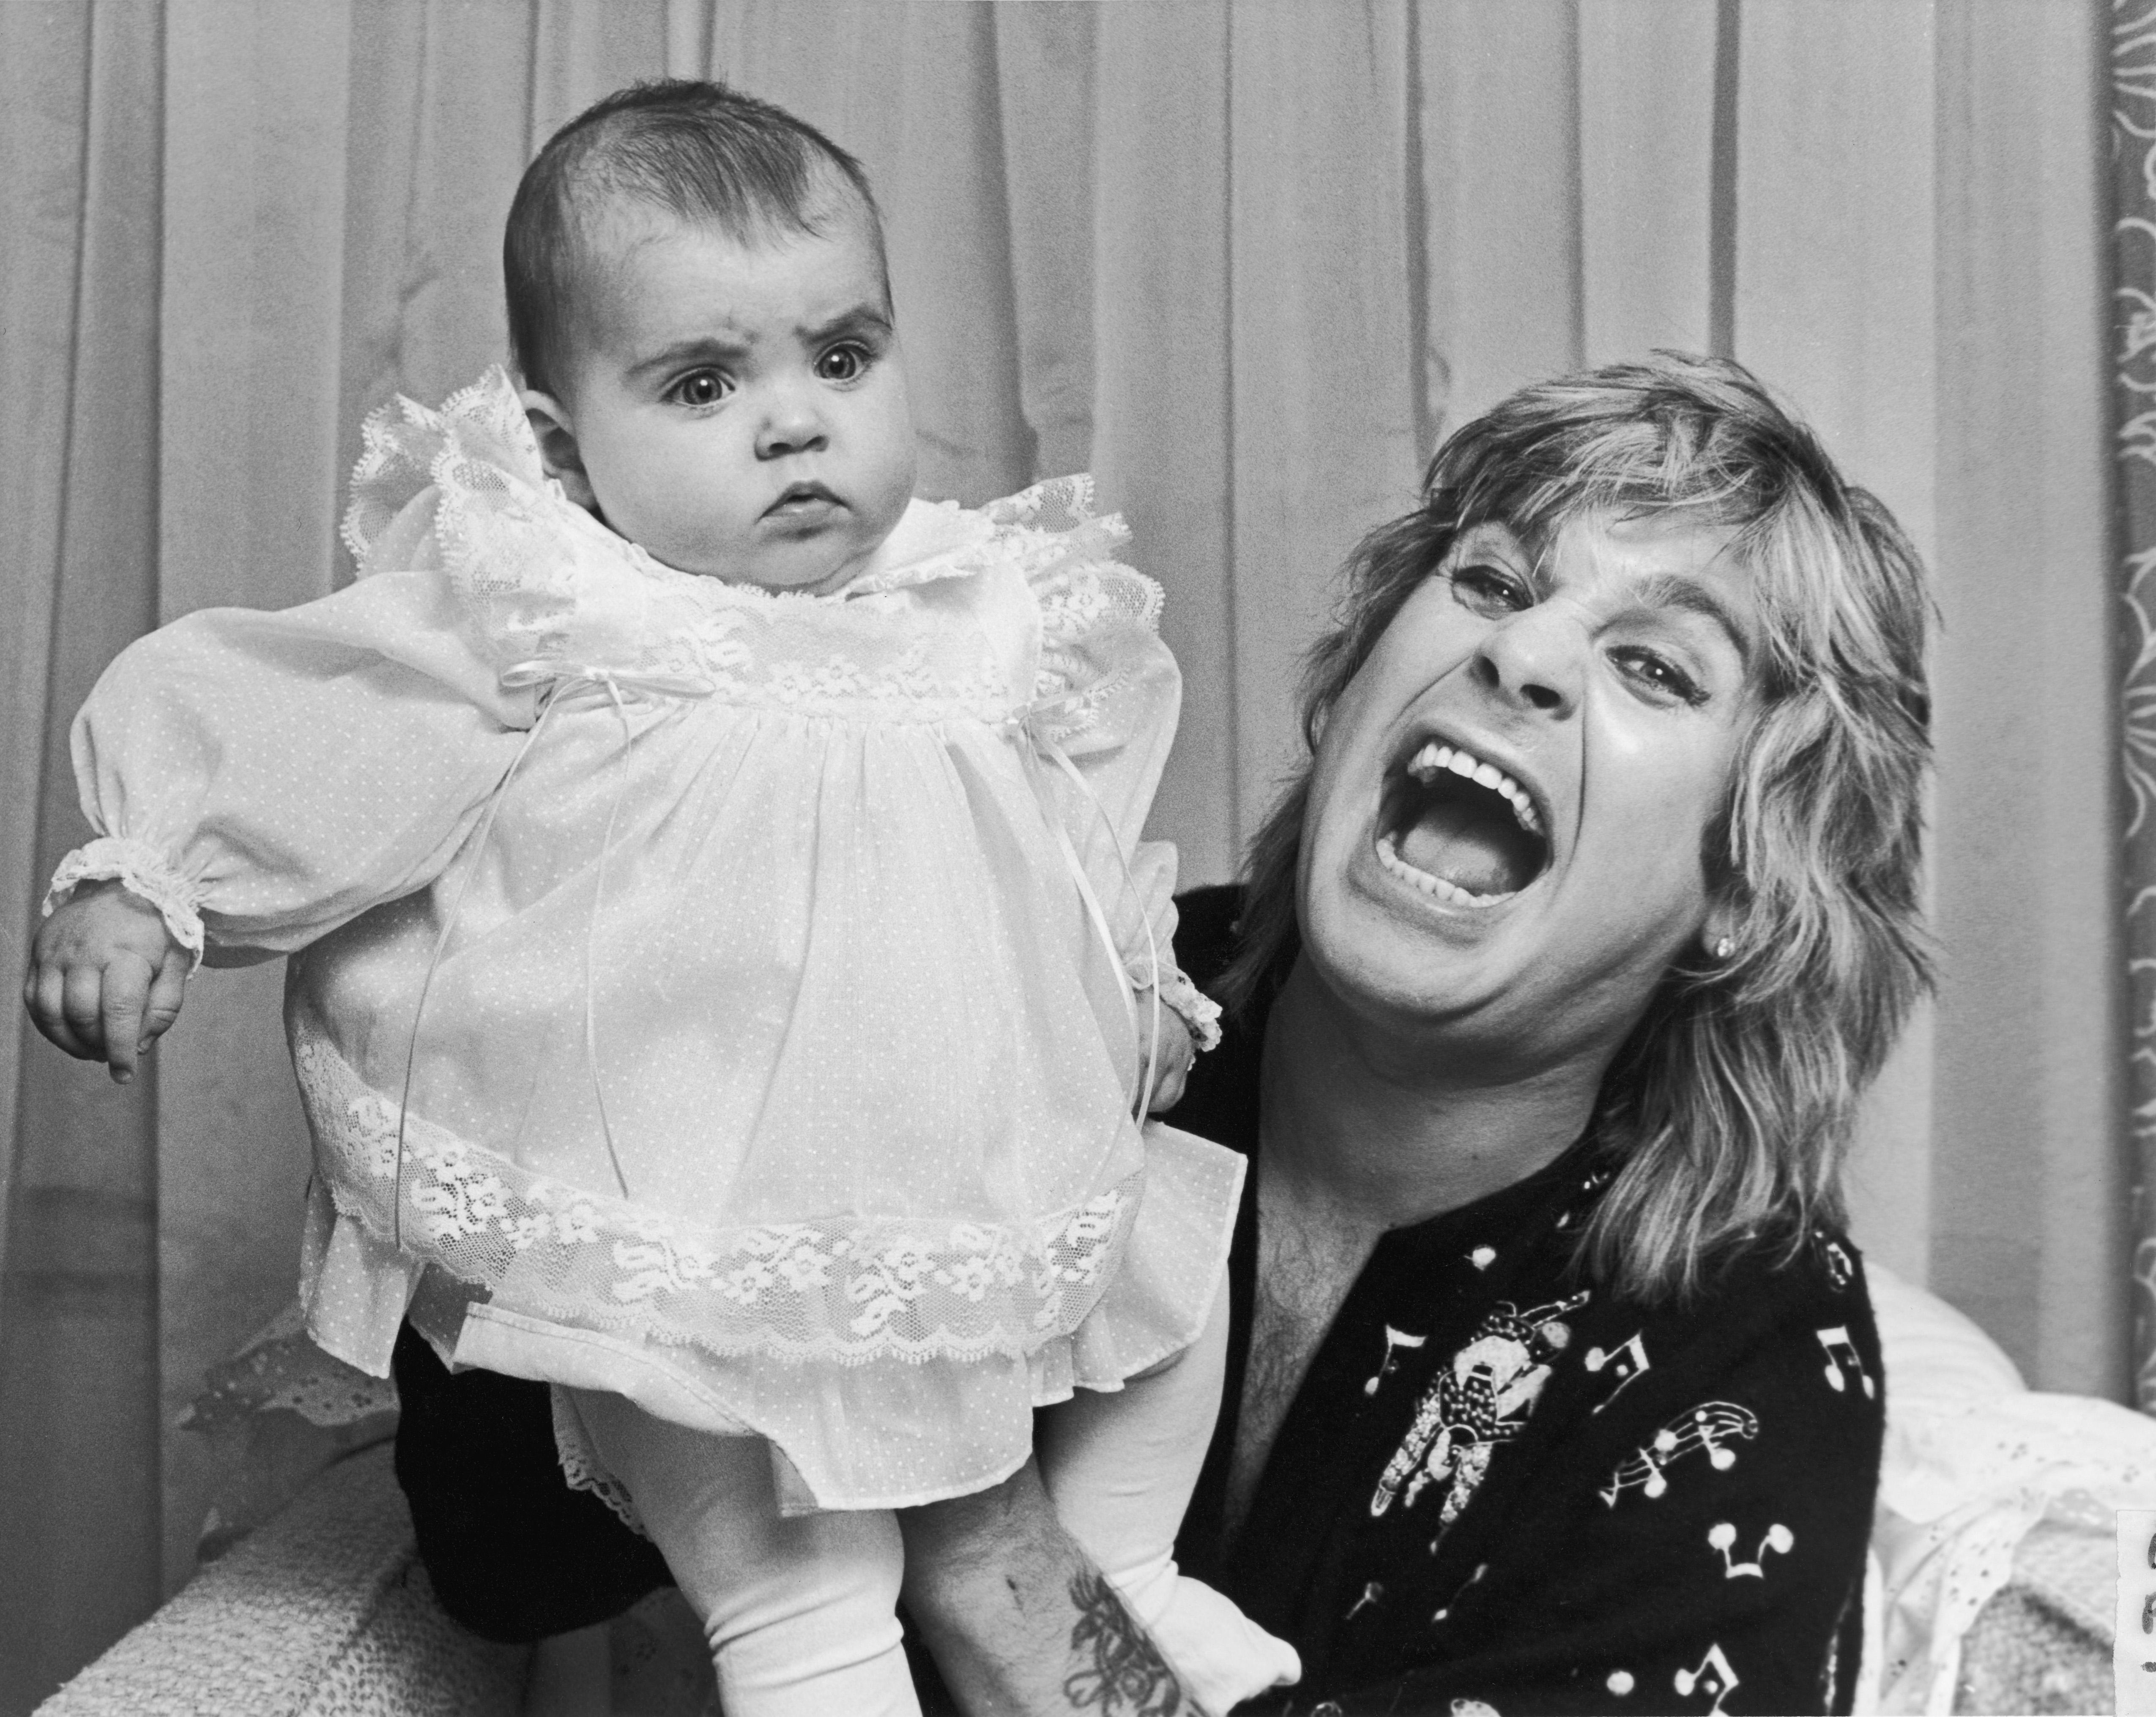 Ozzy and Aimée Osbourne in 1984. (Photo: DMI/Time Inc.)